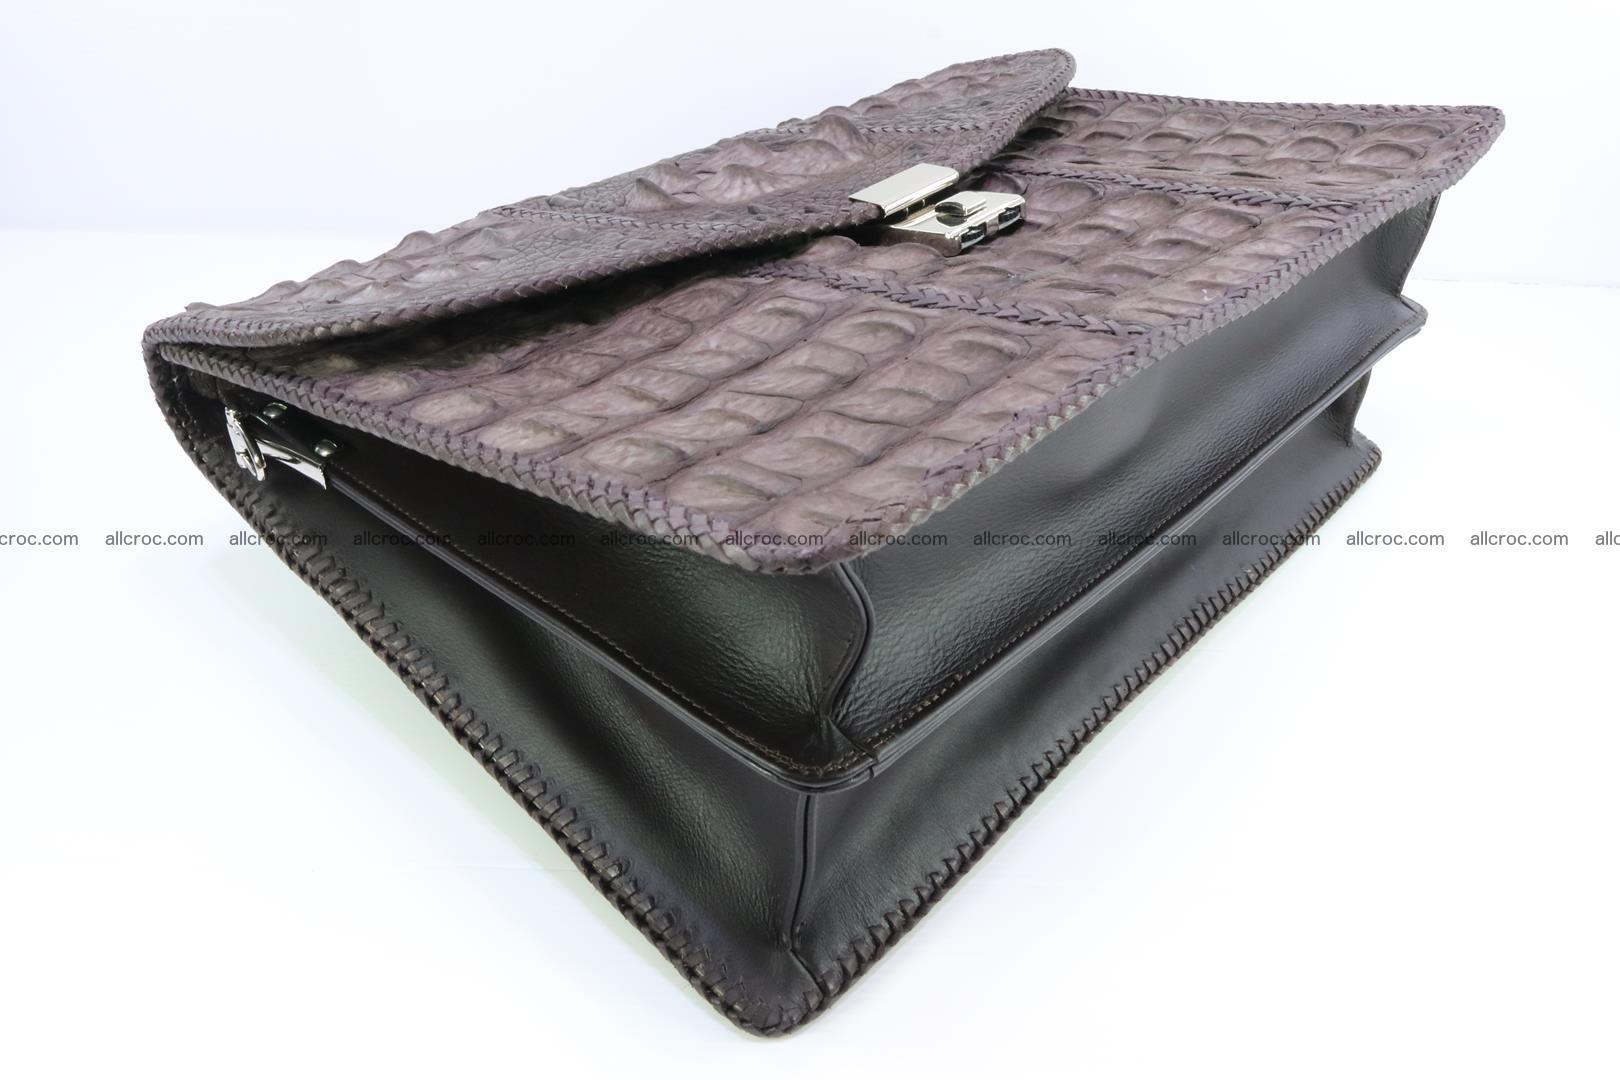 Hand braided crocodile skin briefcase 149 Foto 13